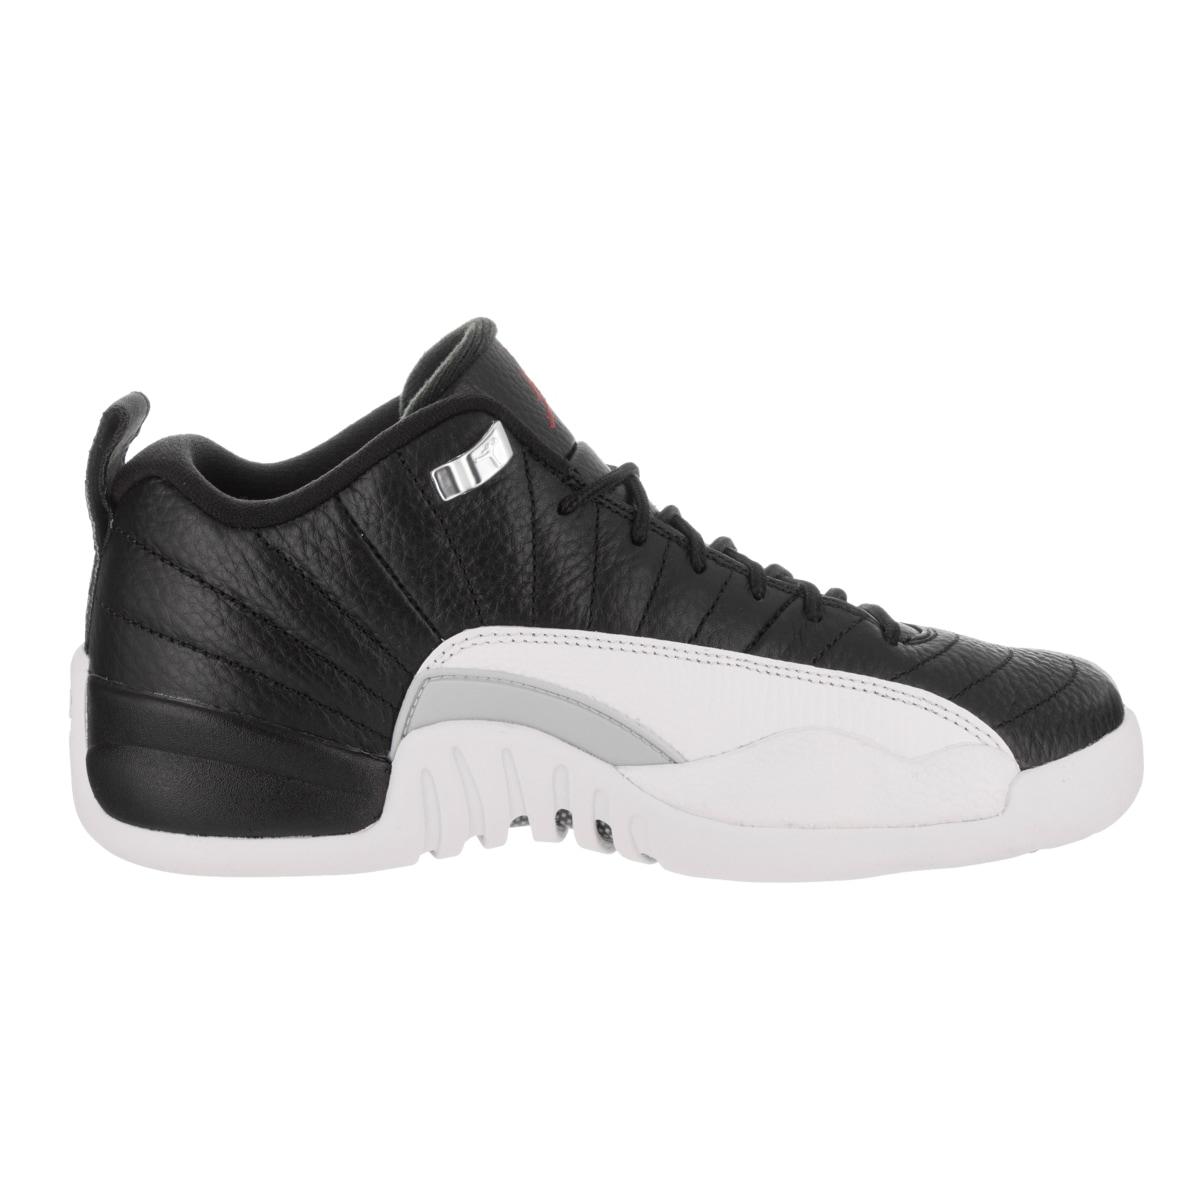 finest selection ca81e 5e771 Shop Nike Jordan Kids Air Jordan 12 Retro Low BG Basketball Shoe - Free  Shipping Today - Overstock - 15858327